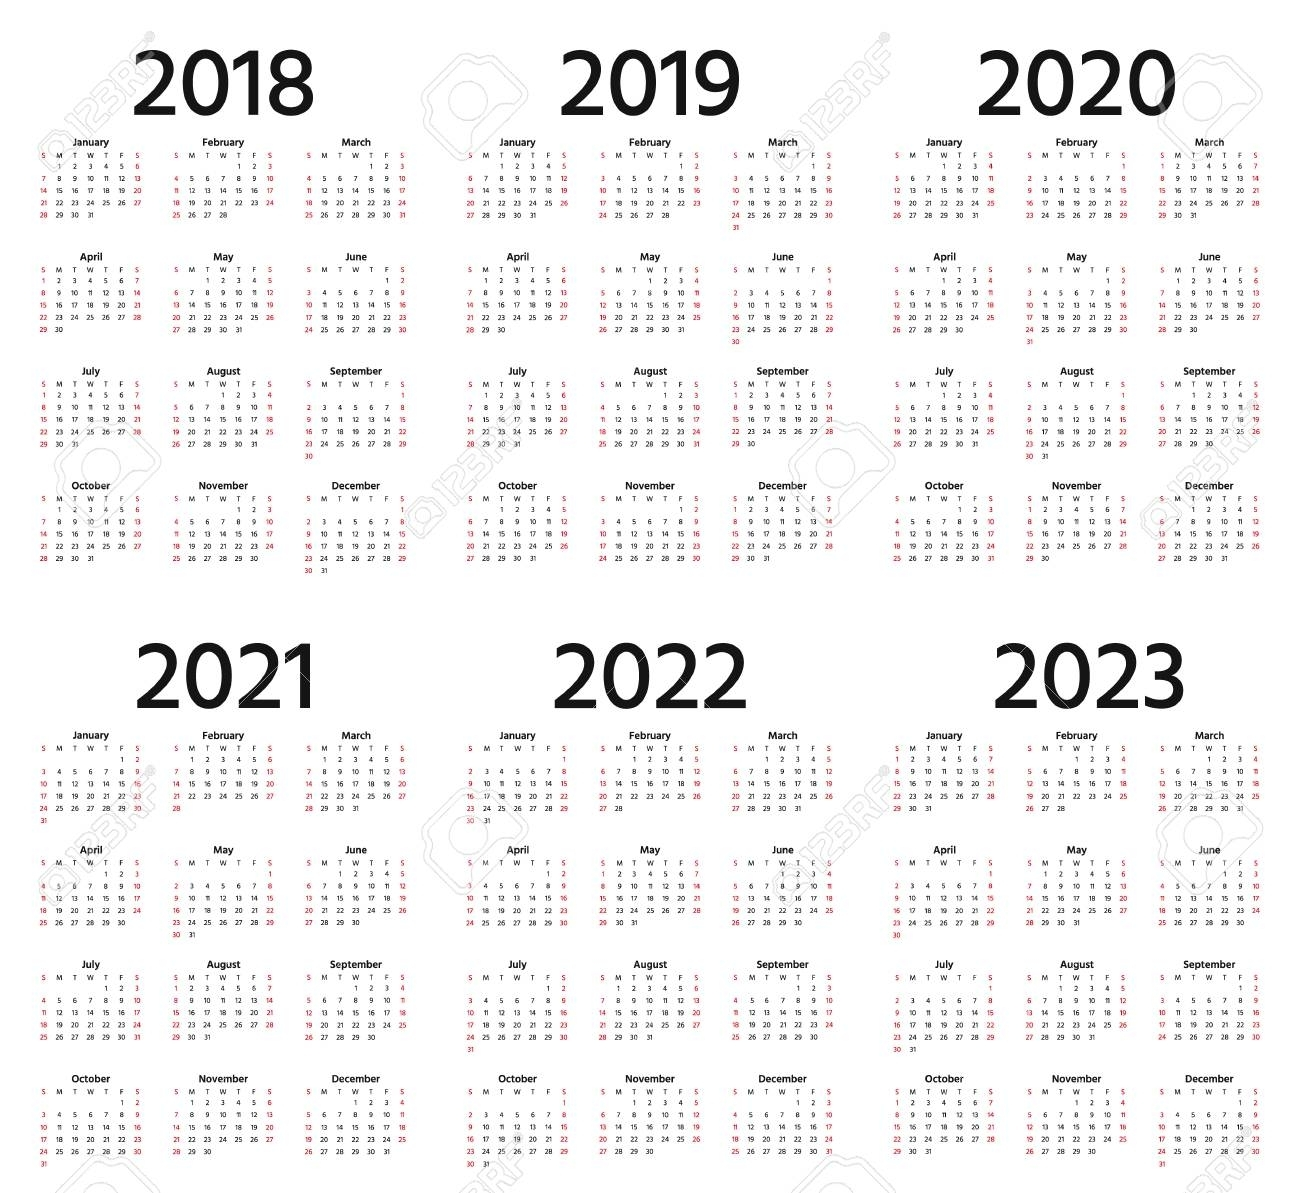 Calendar 2018, 2019, 2020, 2021, 2022, 2023 Year. Week Starts with Print 2019, 2020, 2021, 2022, 2023, Calender